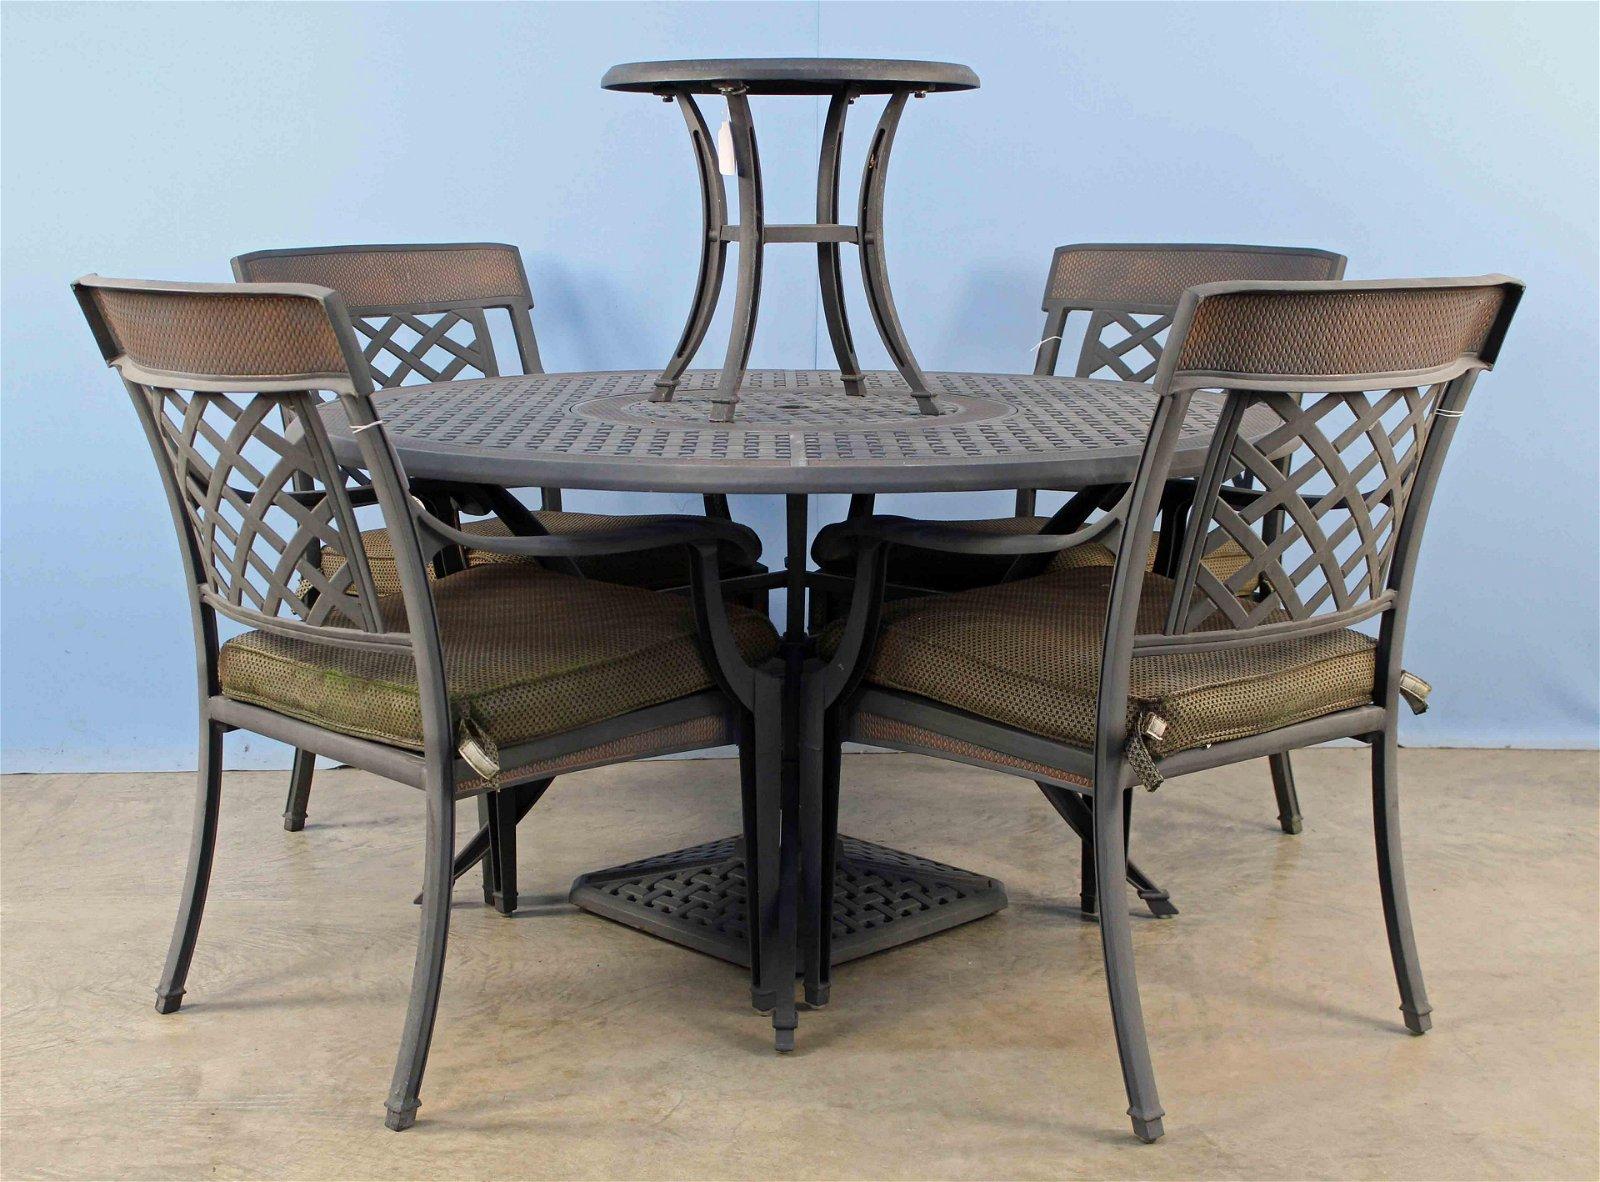 Shop Garden Treasures Chairs & Seating